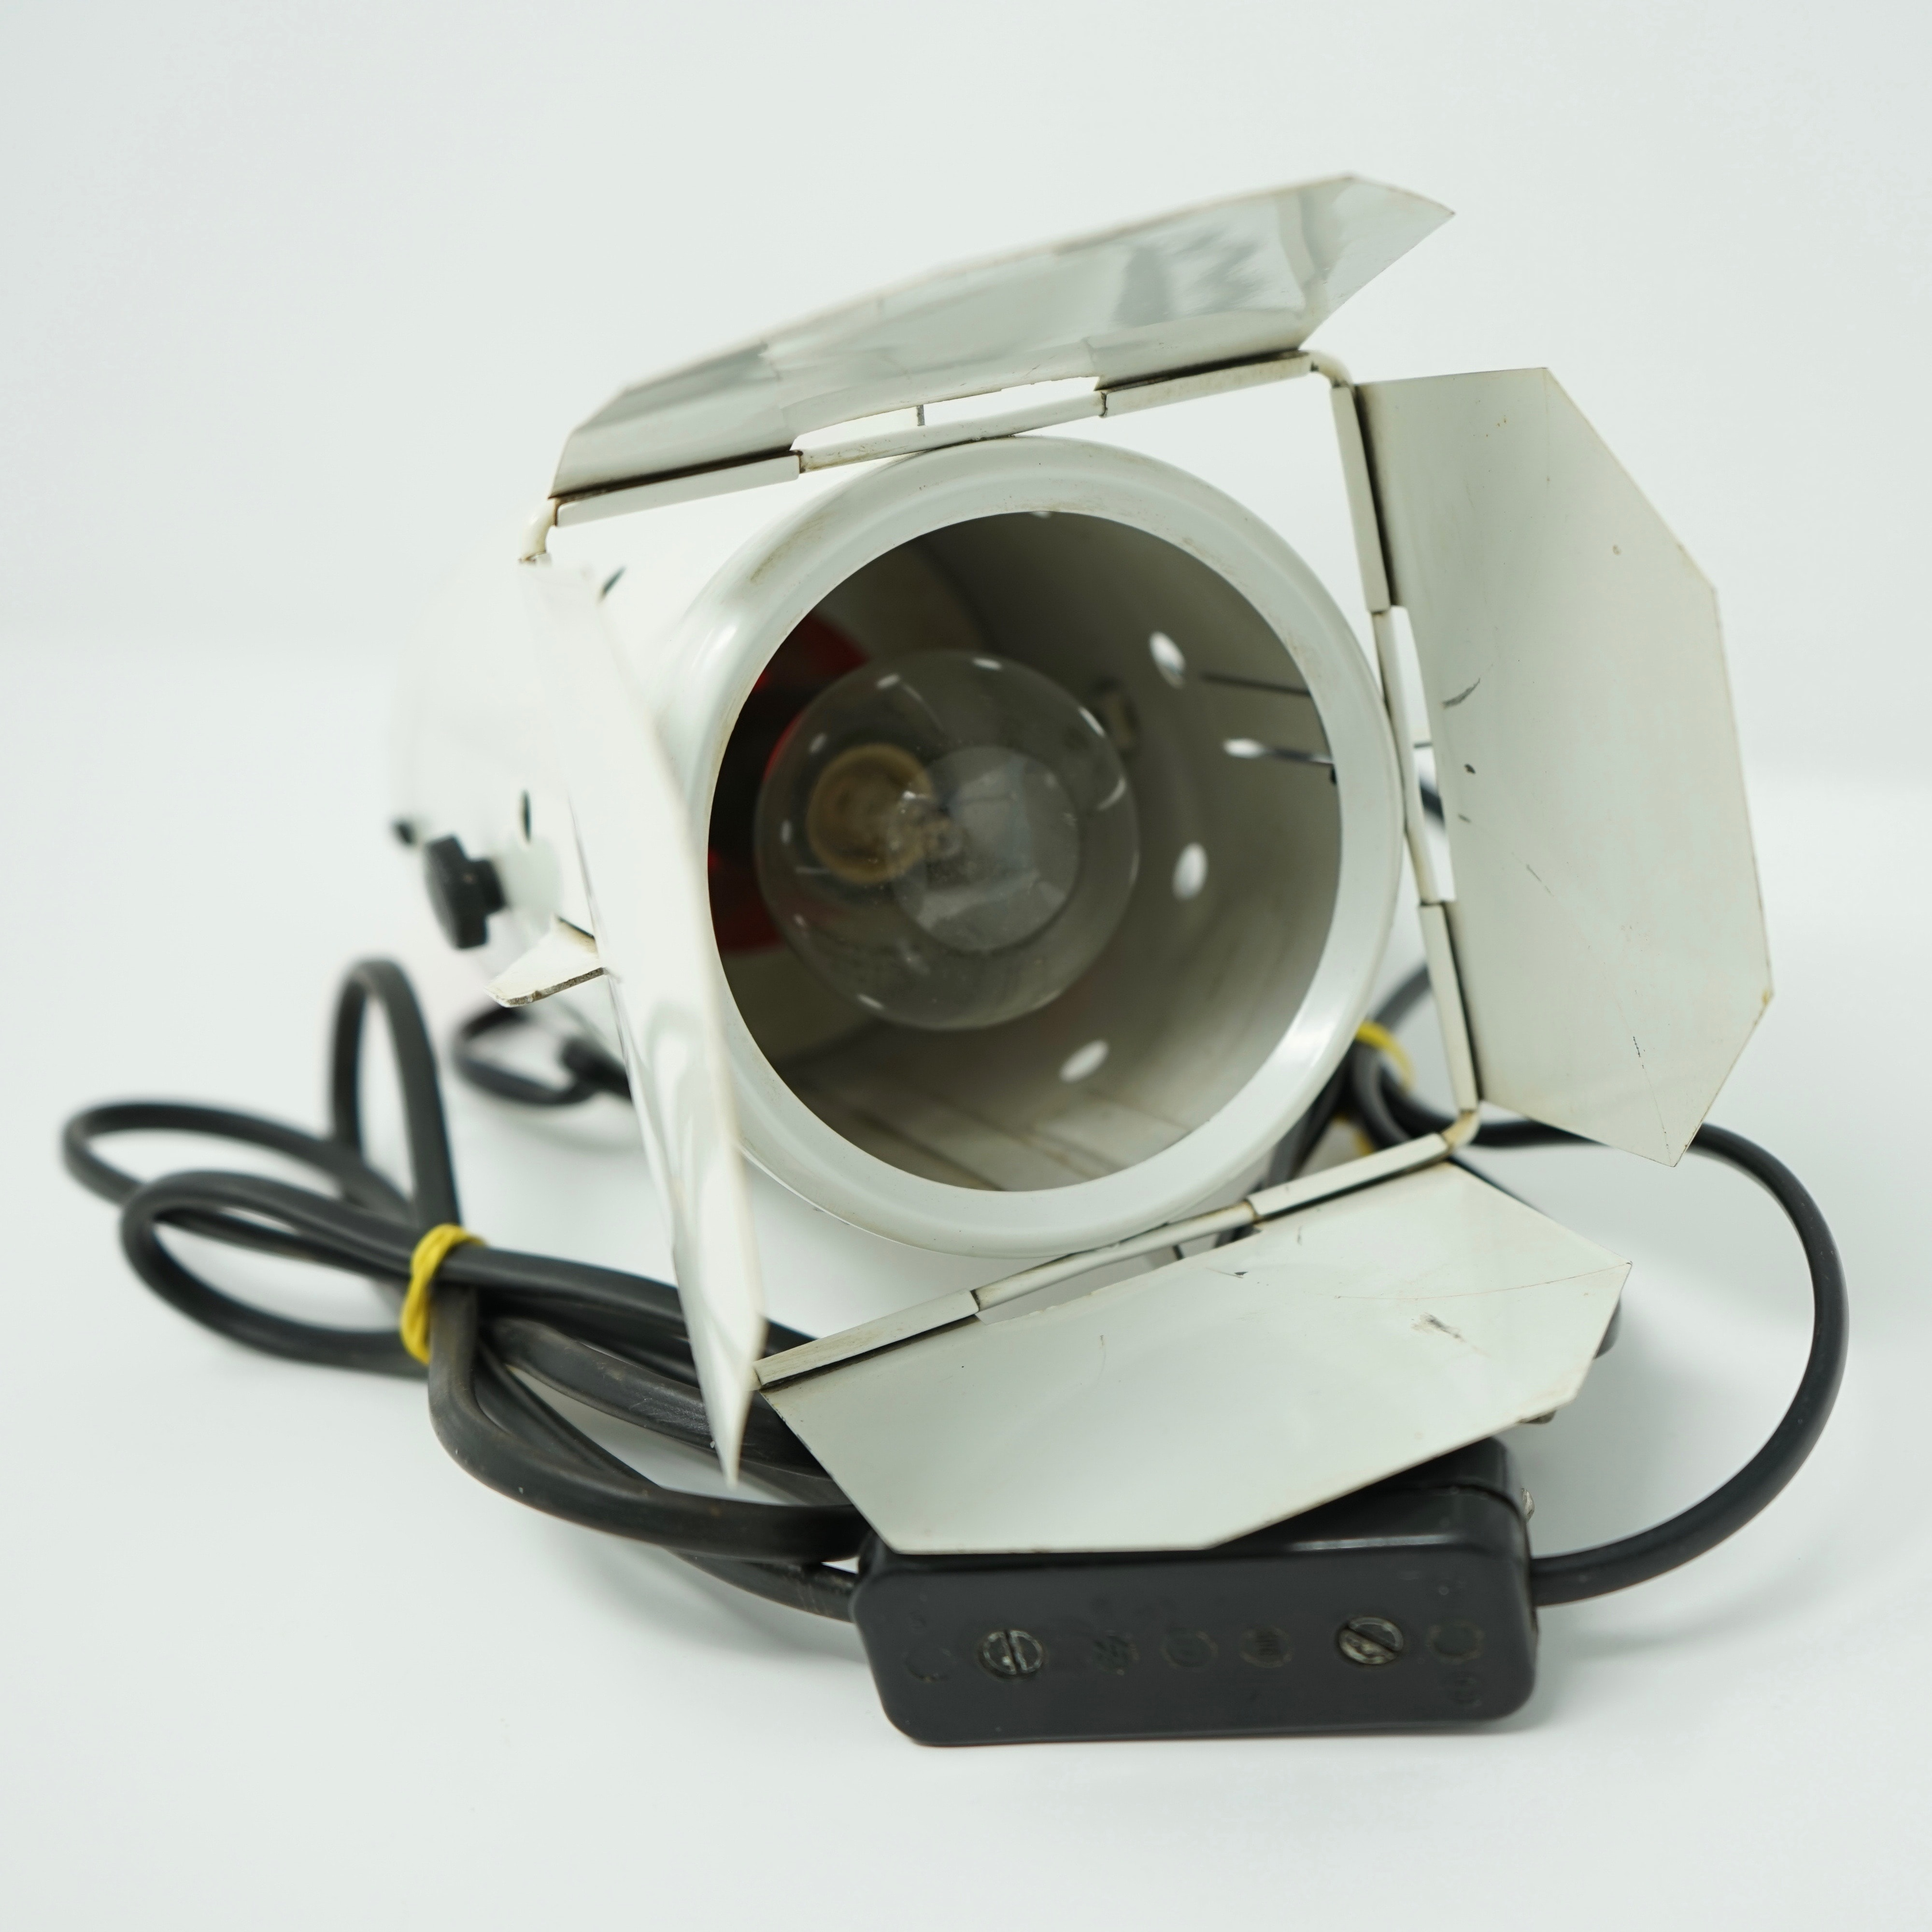 Lampe Apollo Années 1970